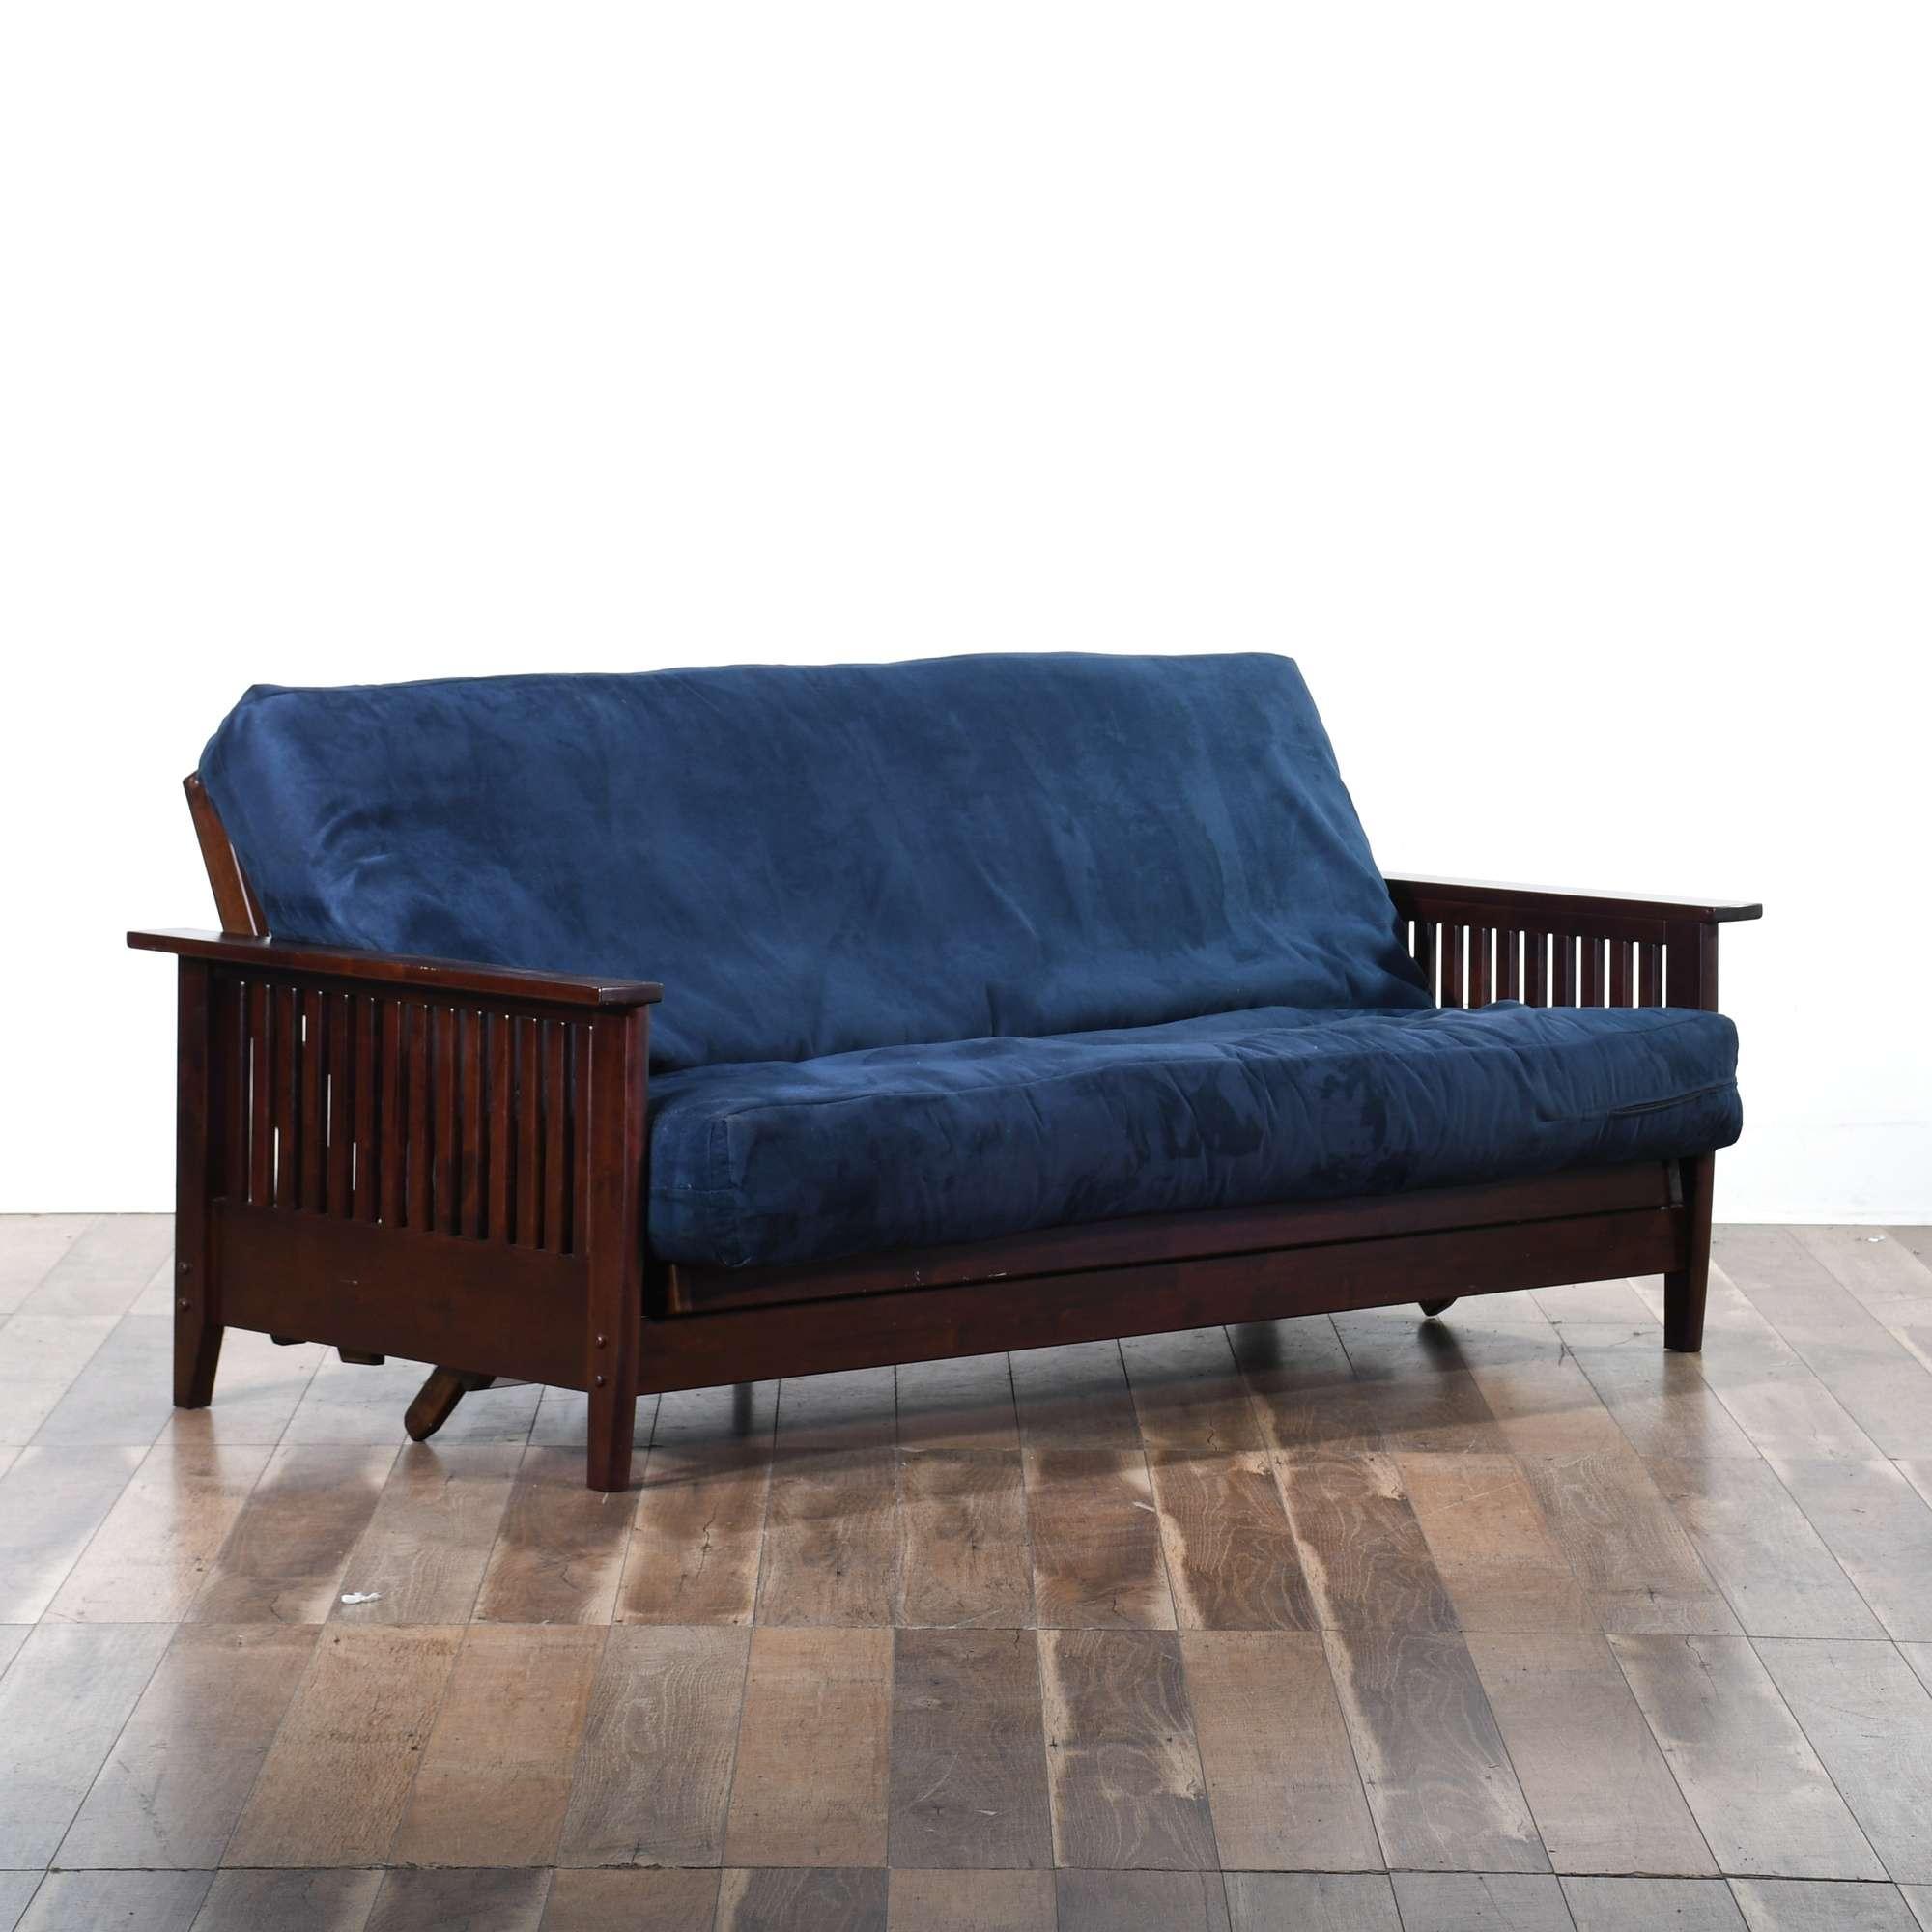 California Craftsman Style Sleeper Sofa W Futon Full Loveseat Online Auctions Los Angeles